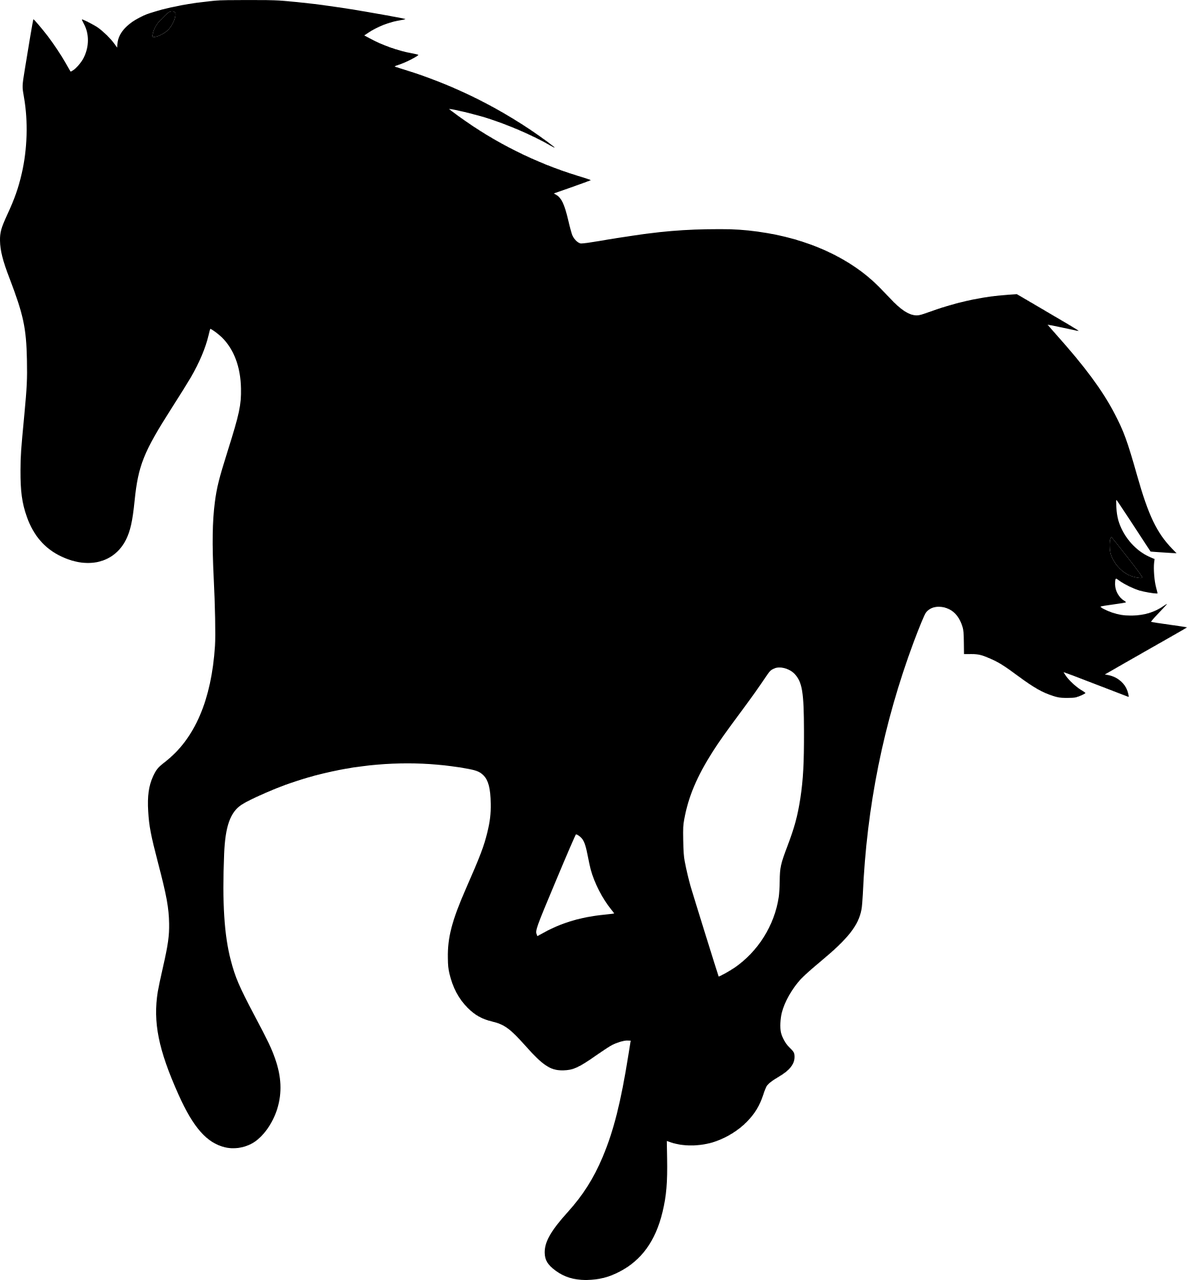 Horse clipart front. Black png image purepng